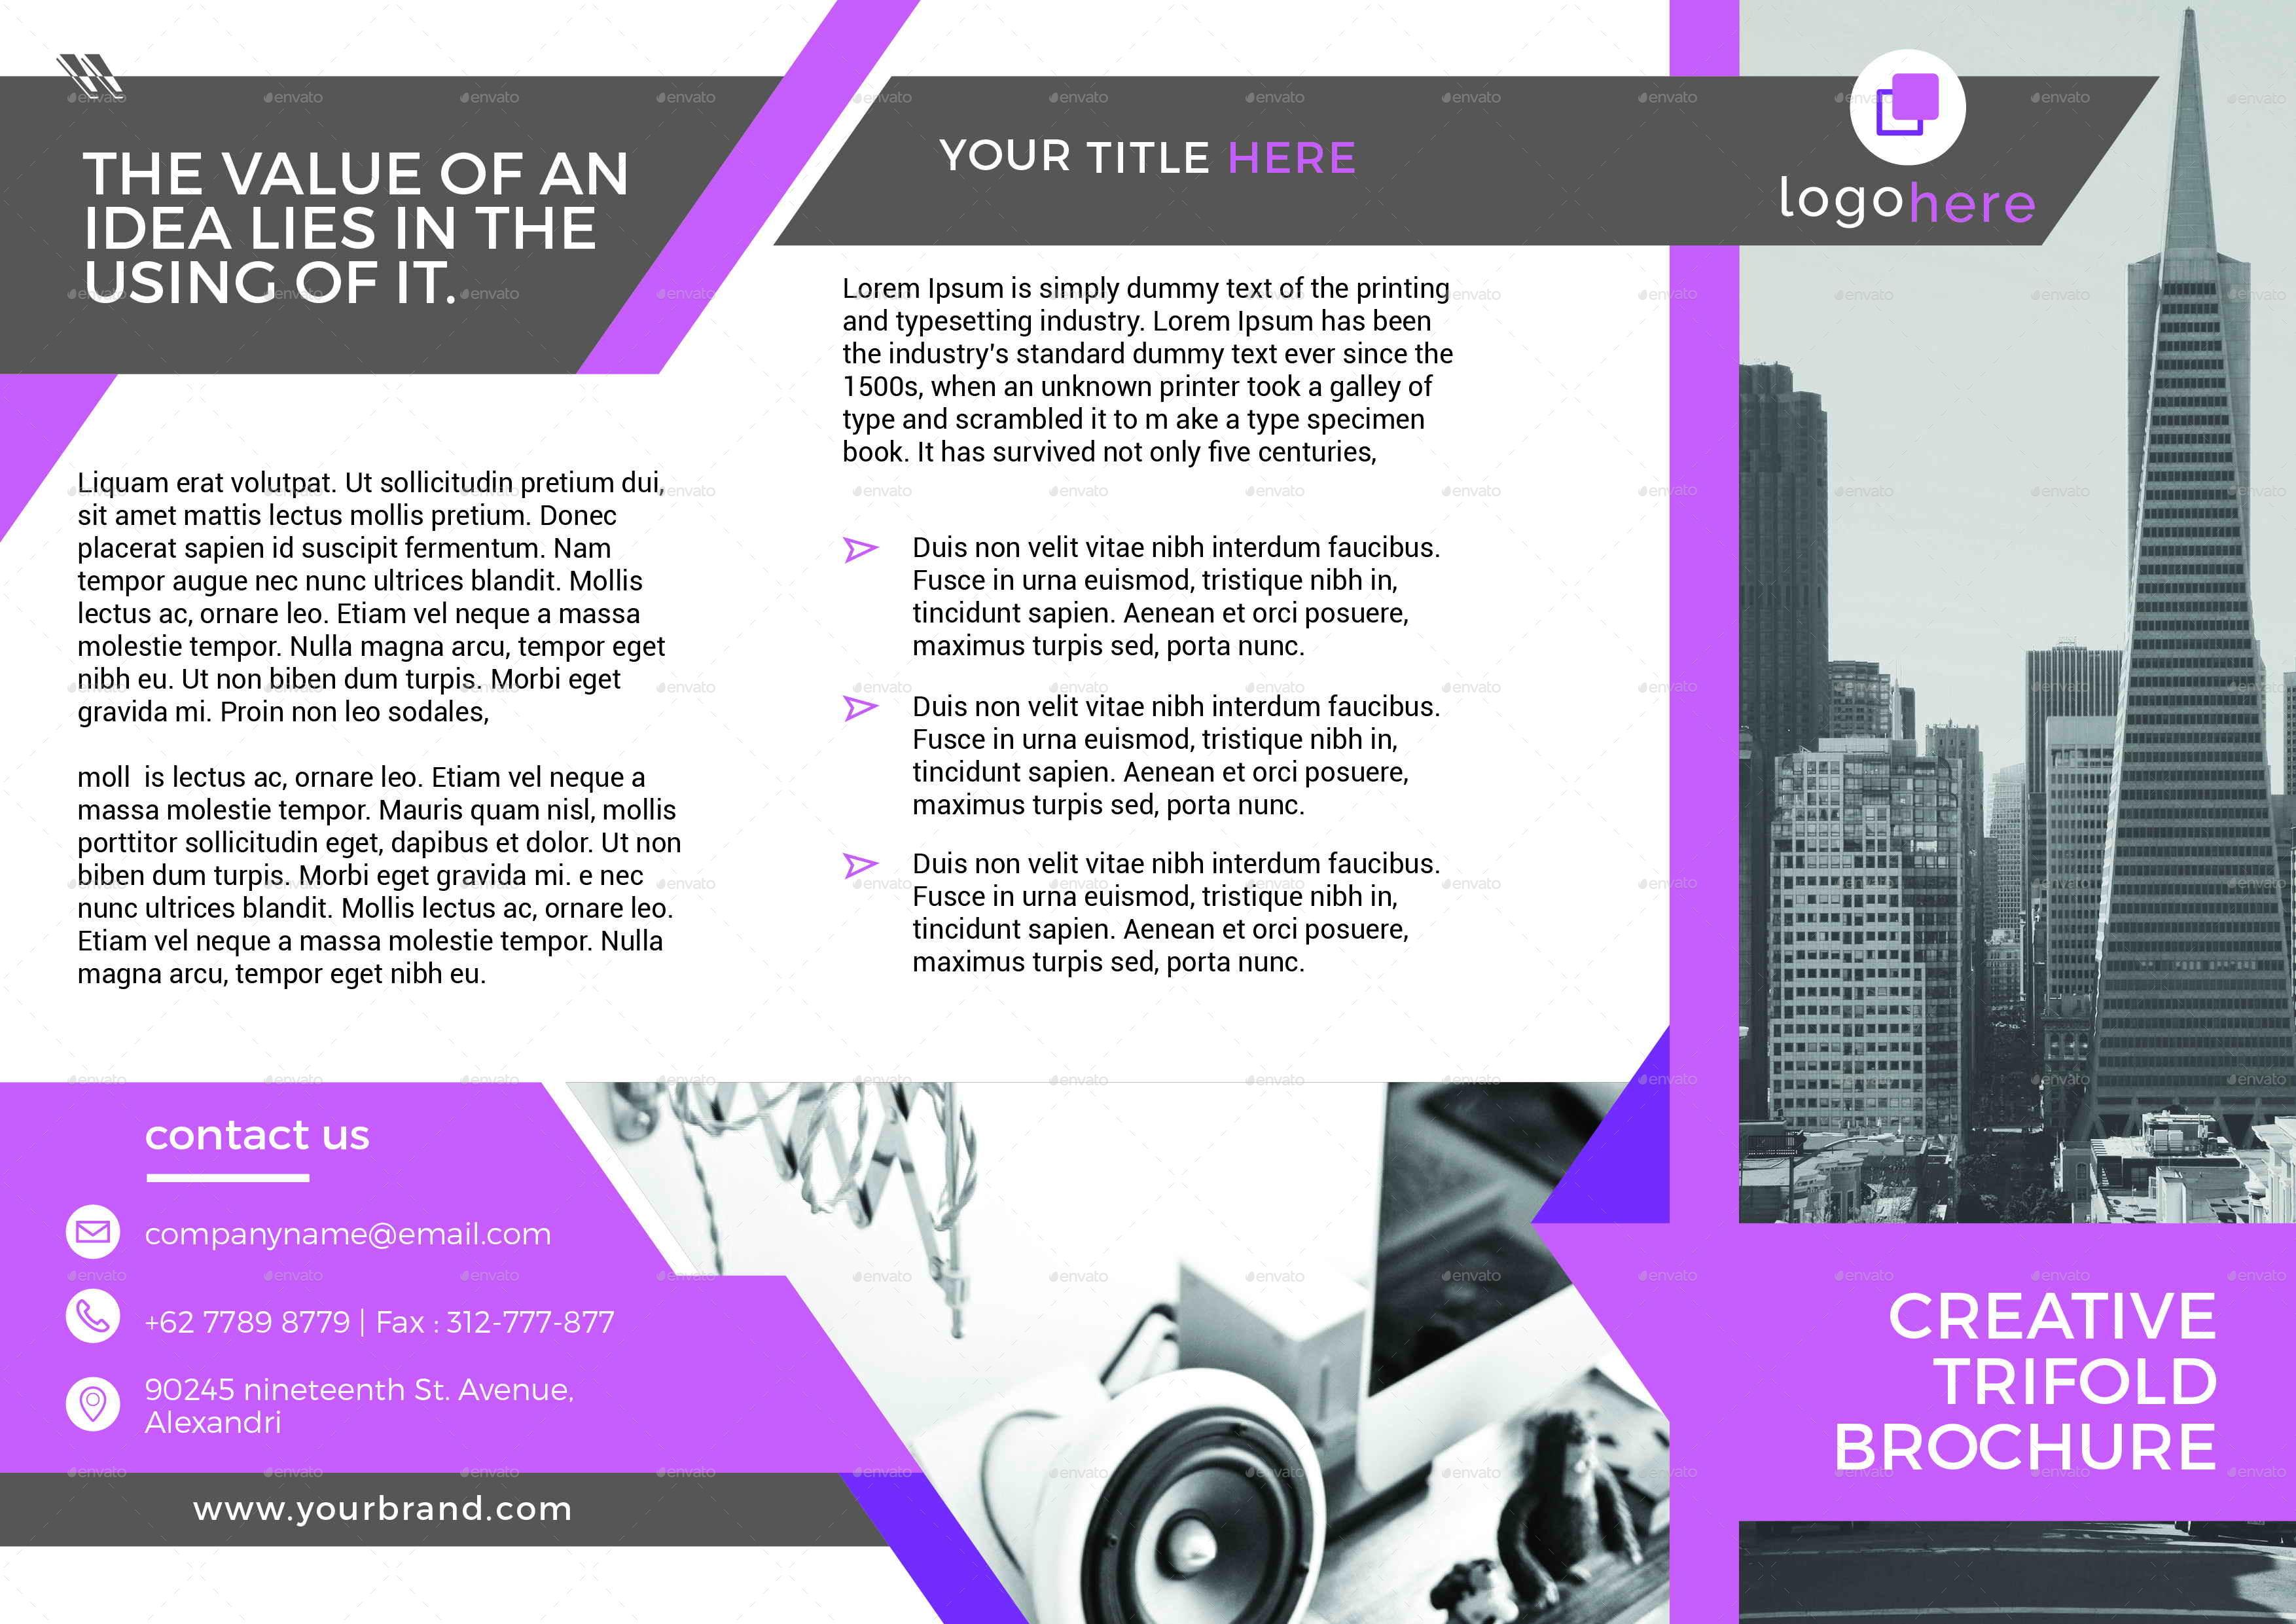 Trifold Brochure By Rilsart